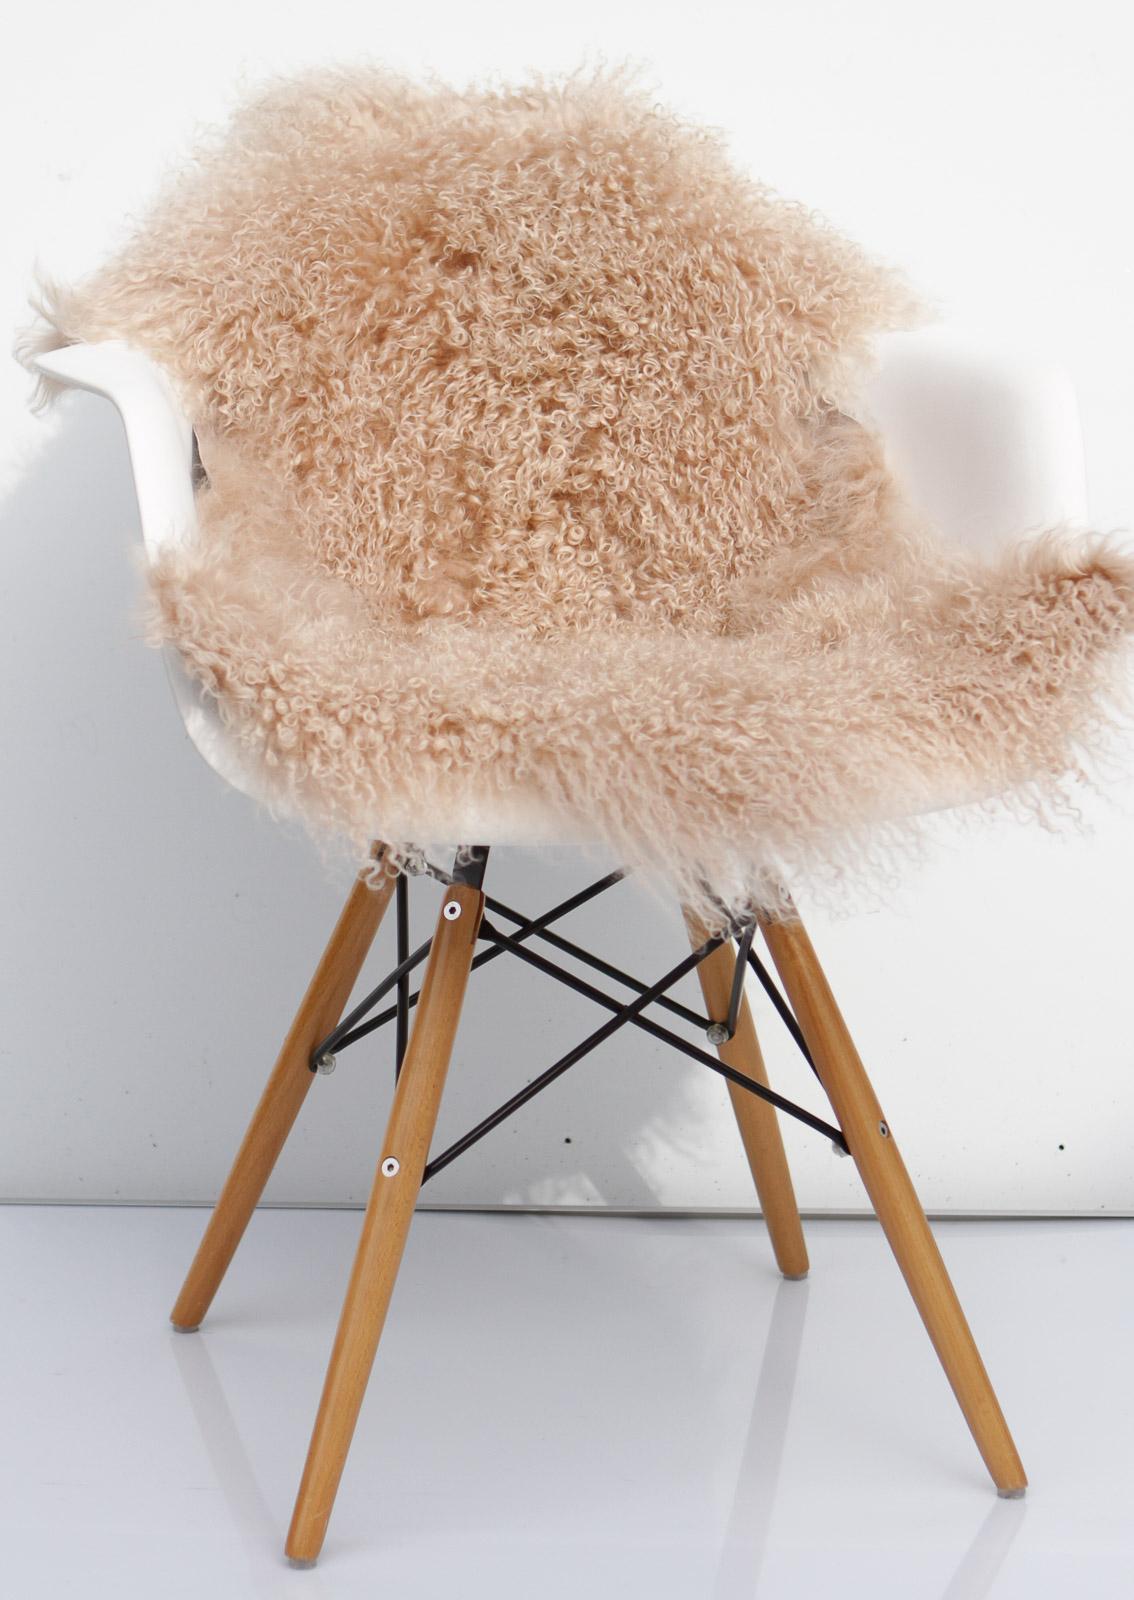 tibet lammfell nudetibetlammfell tibetlamm fein gelockt 90 x 45 cm 90 x 45 cm lammfell. Black Bedroom Furniture Sets. Home Design Ideas